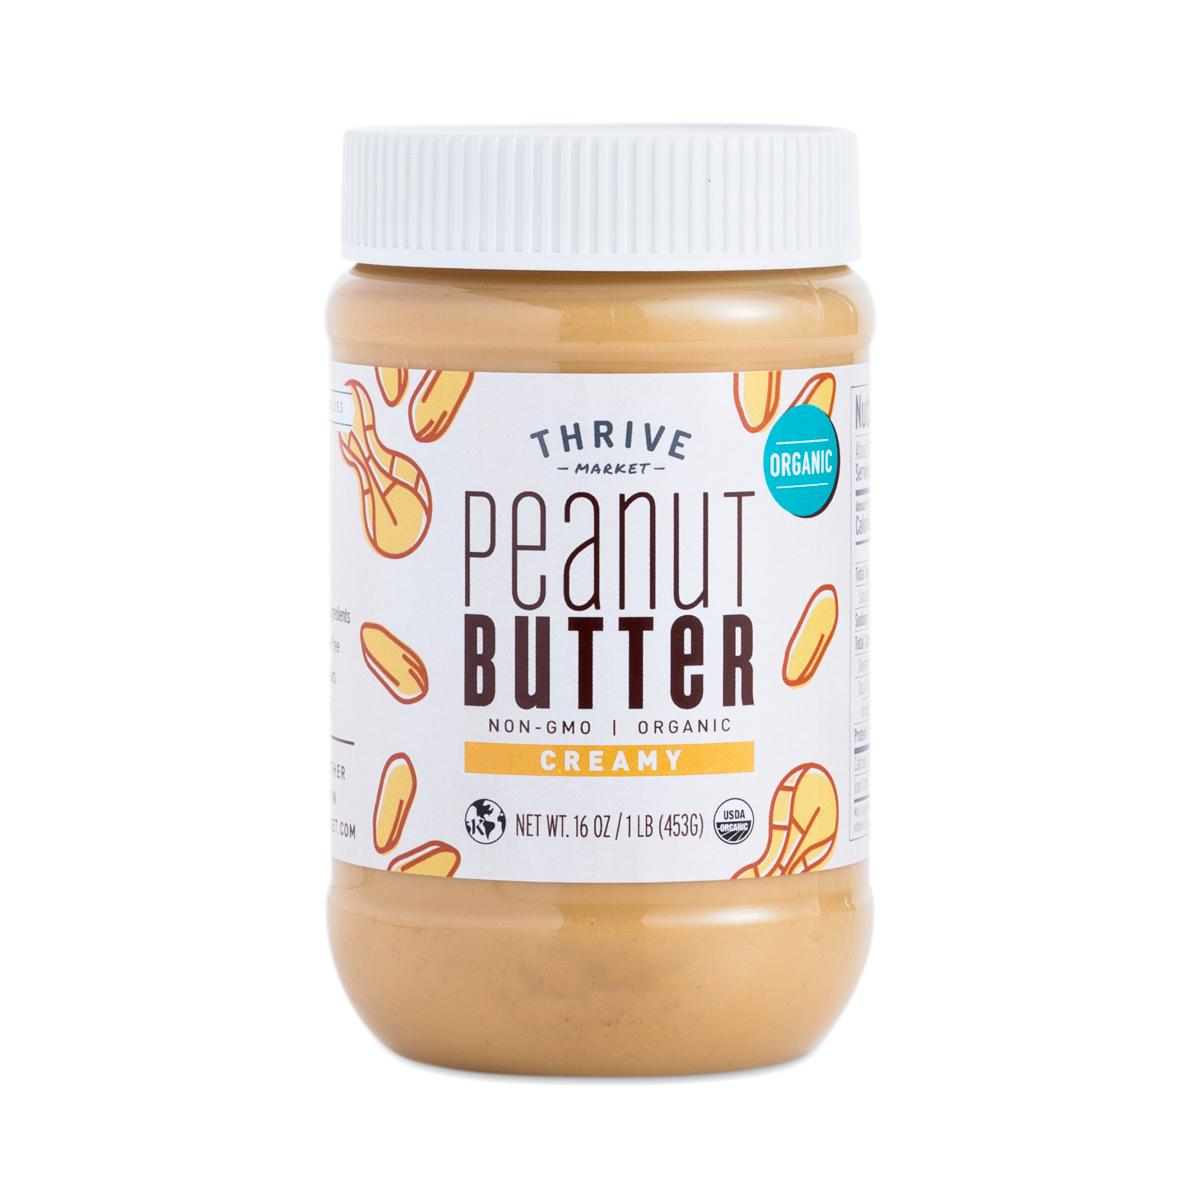 Organic Creamy Peanut Butter Thrive Market